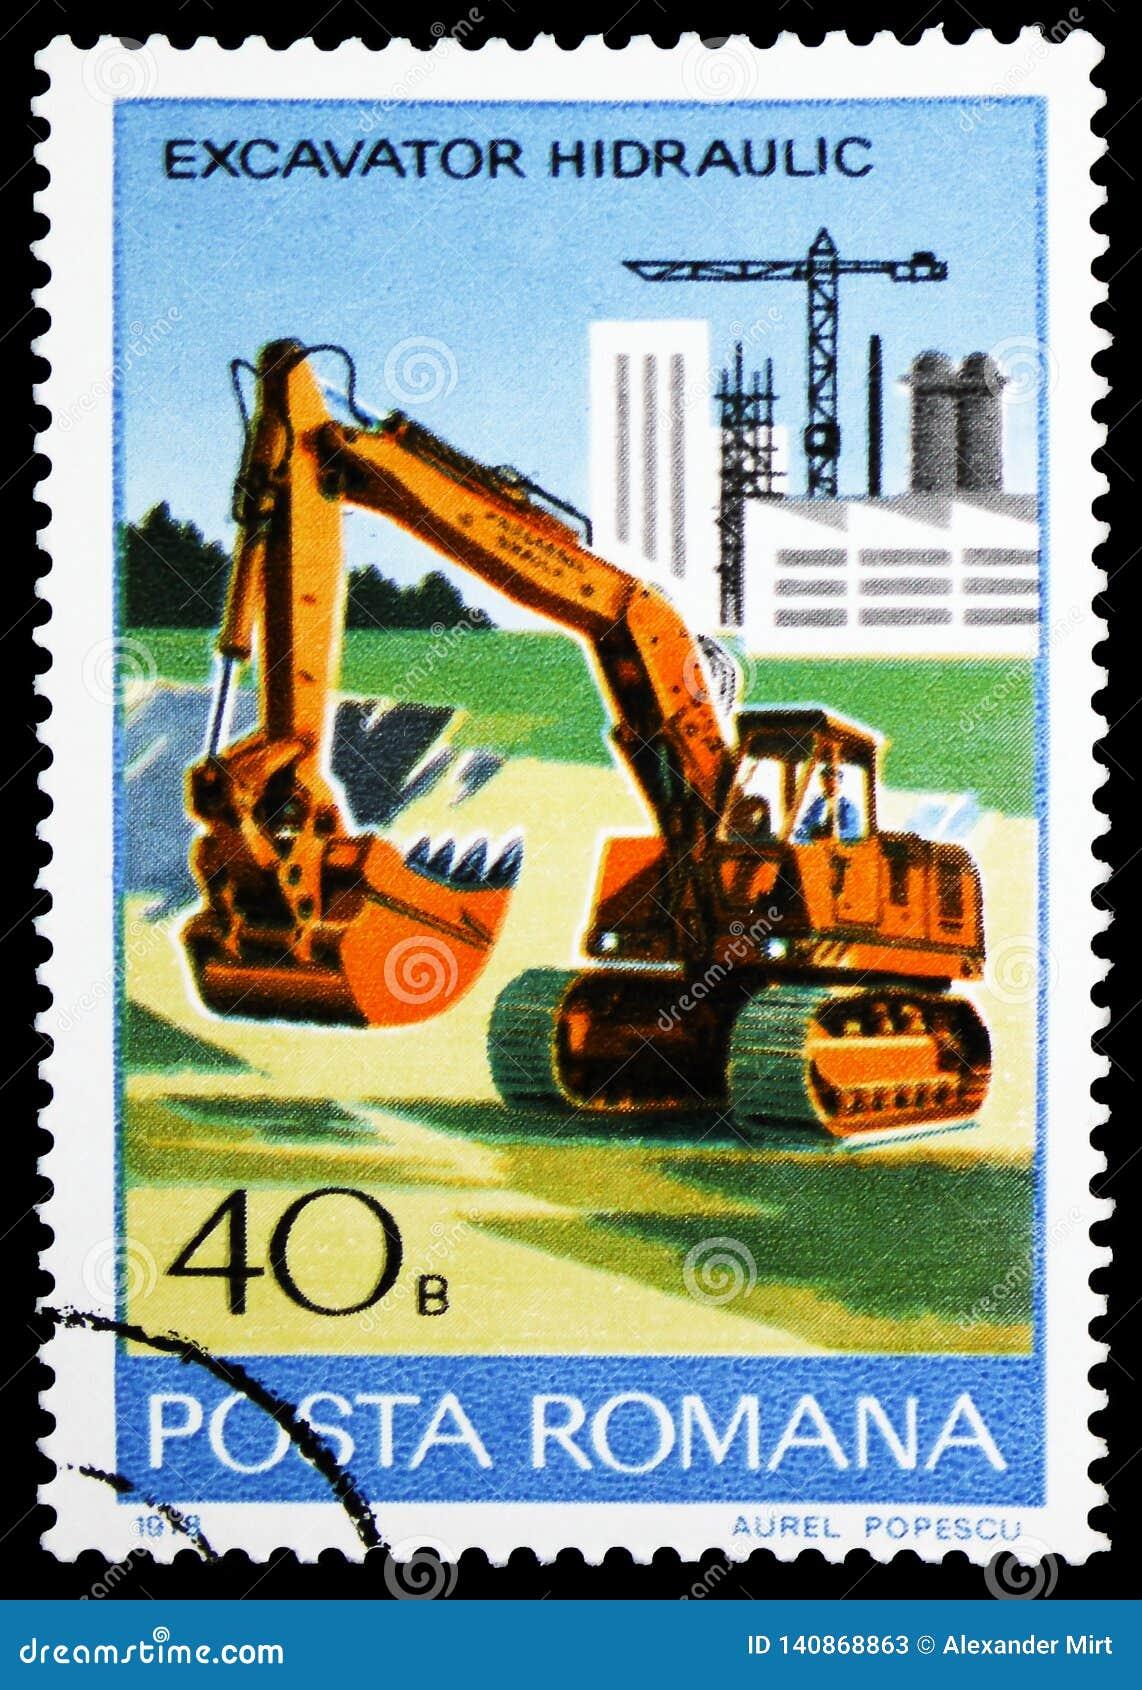 Hydraulic excavator, Industrial Development serie, circa 1978